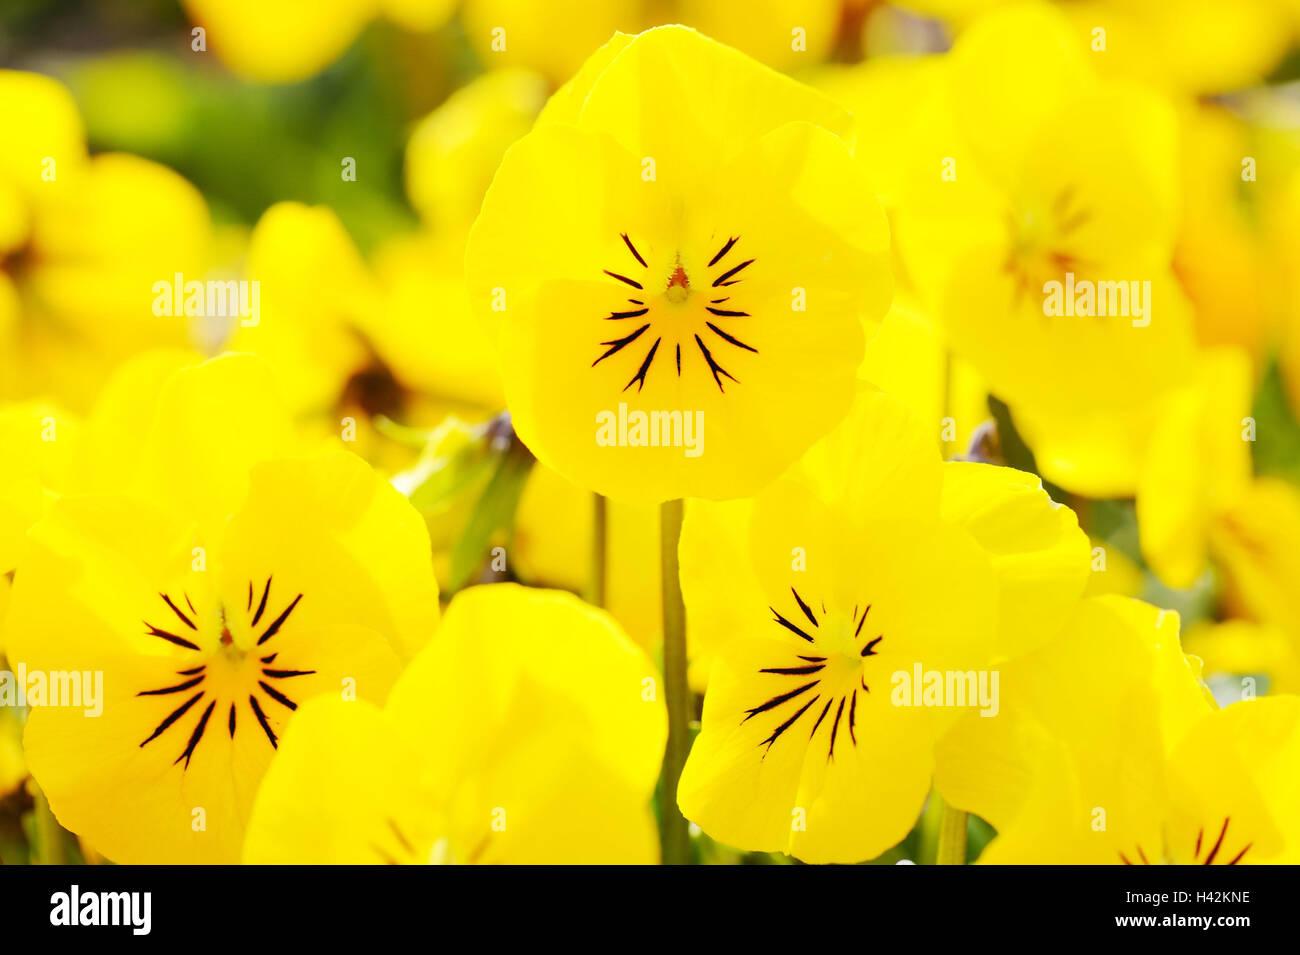 Garden pansies, viola wittrockiana, blossom, yellow shine, medium close-up, flowers, garden pansies, violet plants, - Stock Image